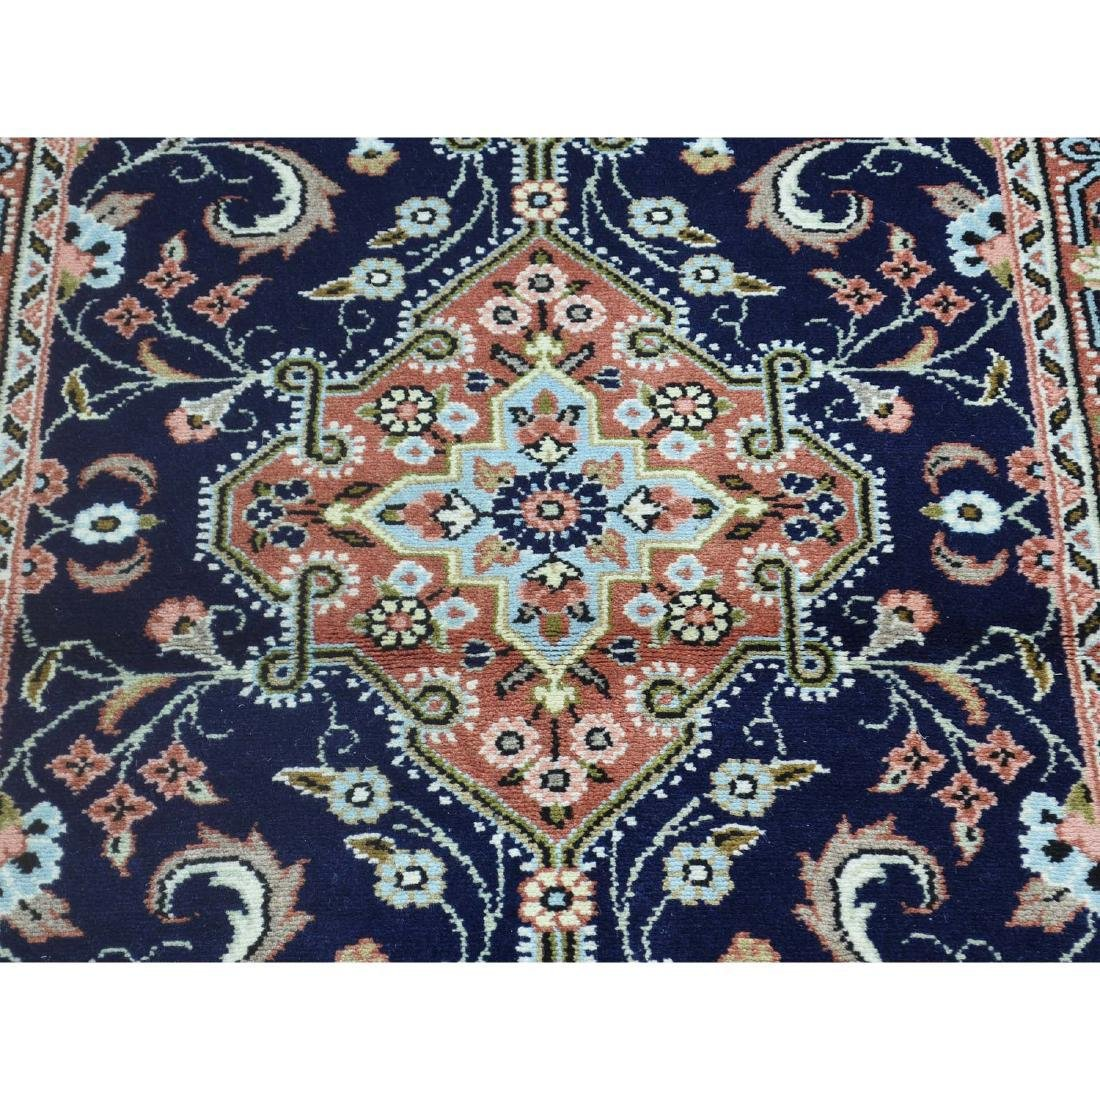 Handmade Persian Hamadan Runner Oriental Rug 2.8x10.2 - 10